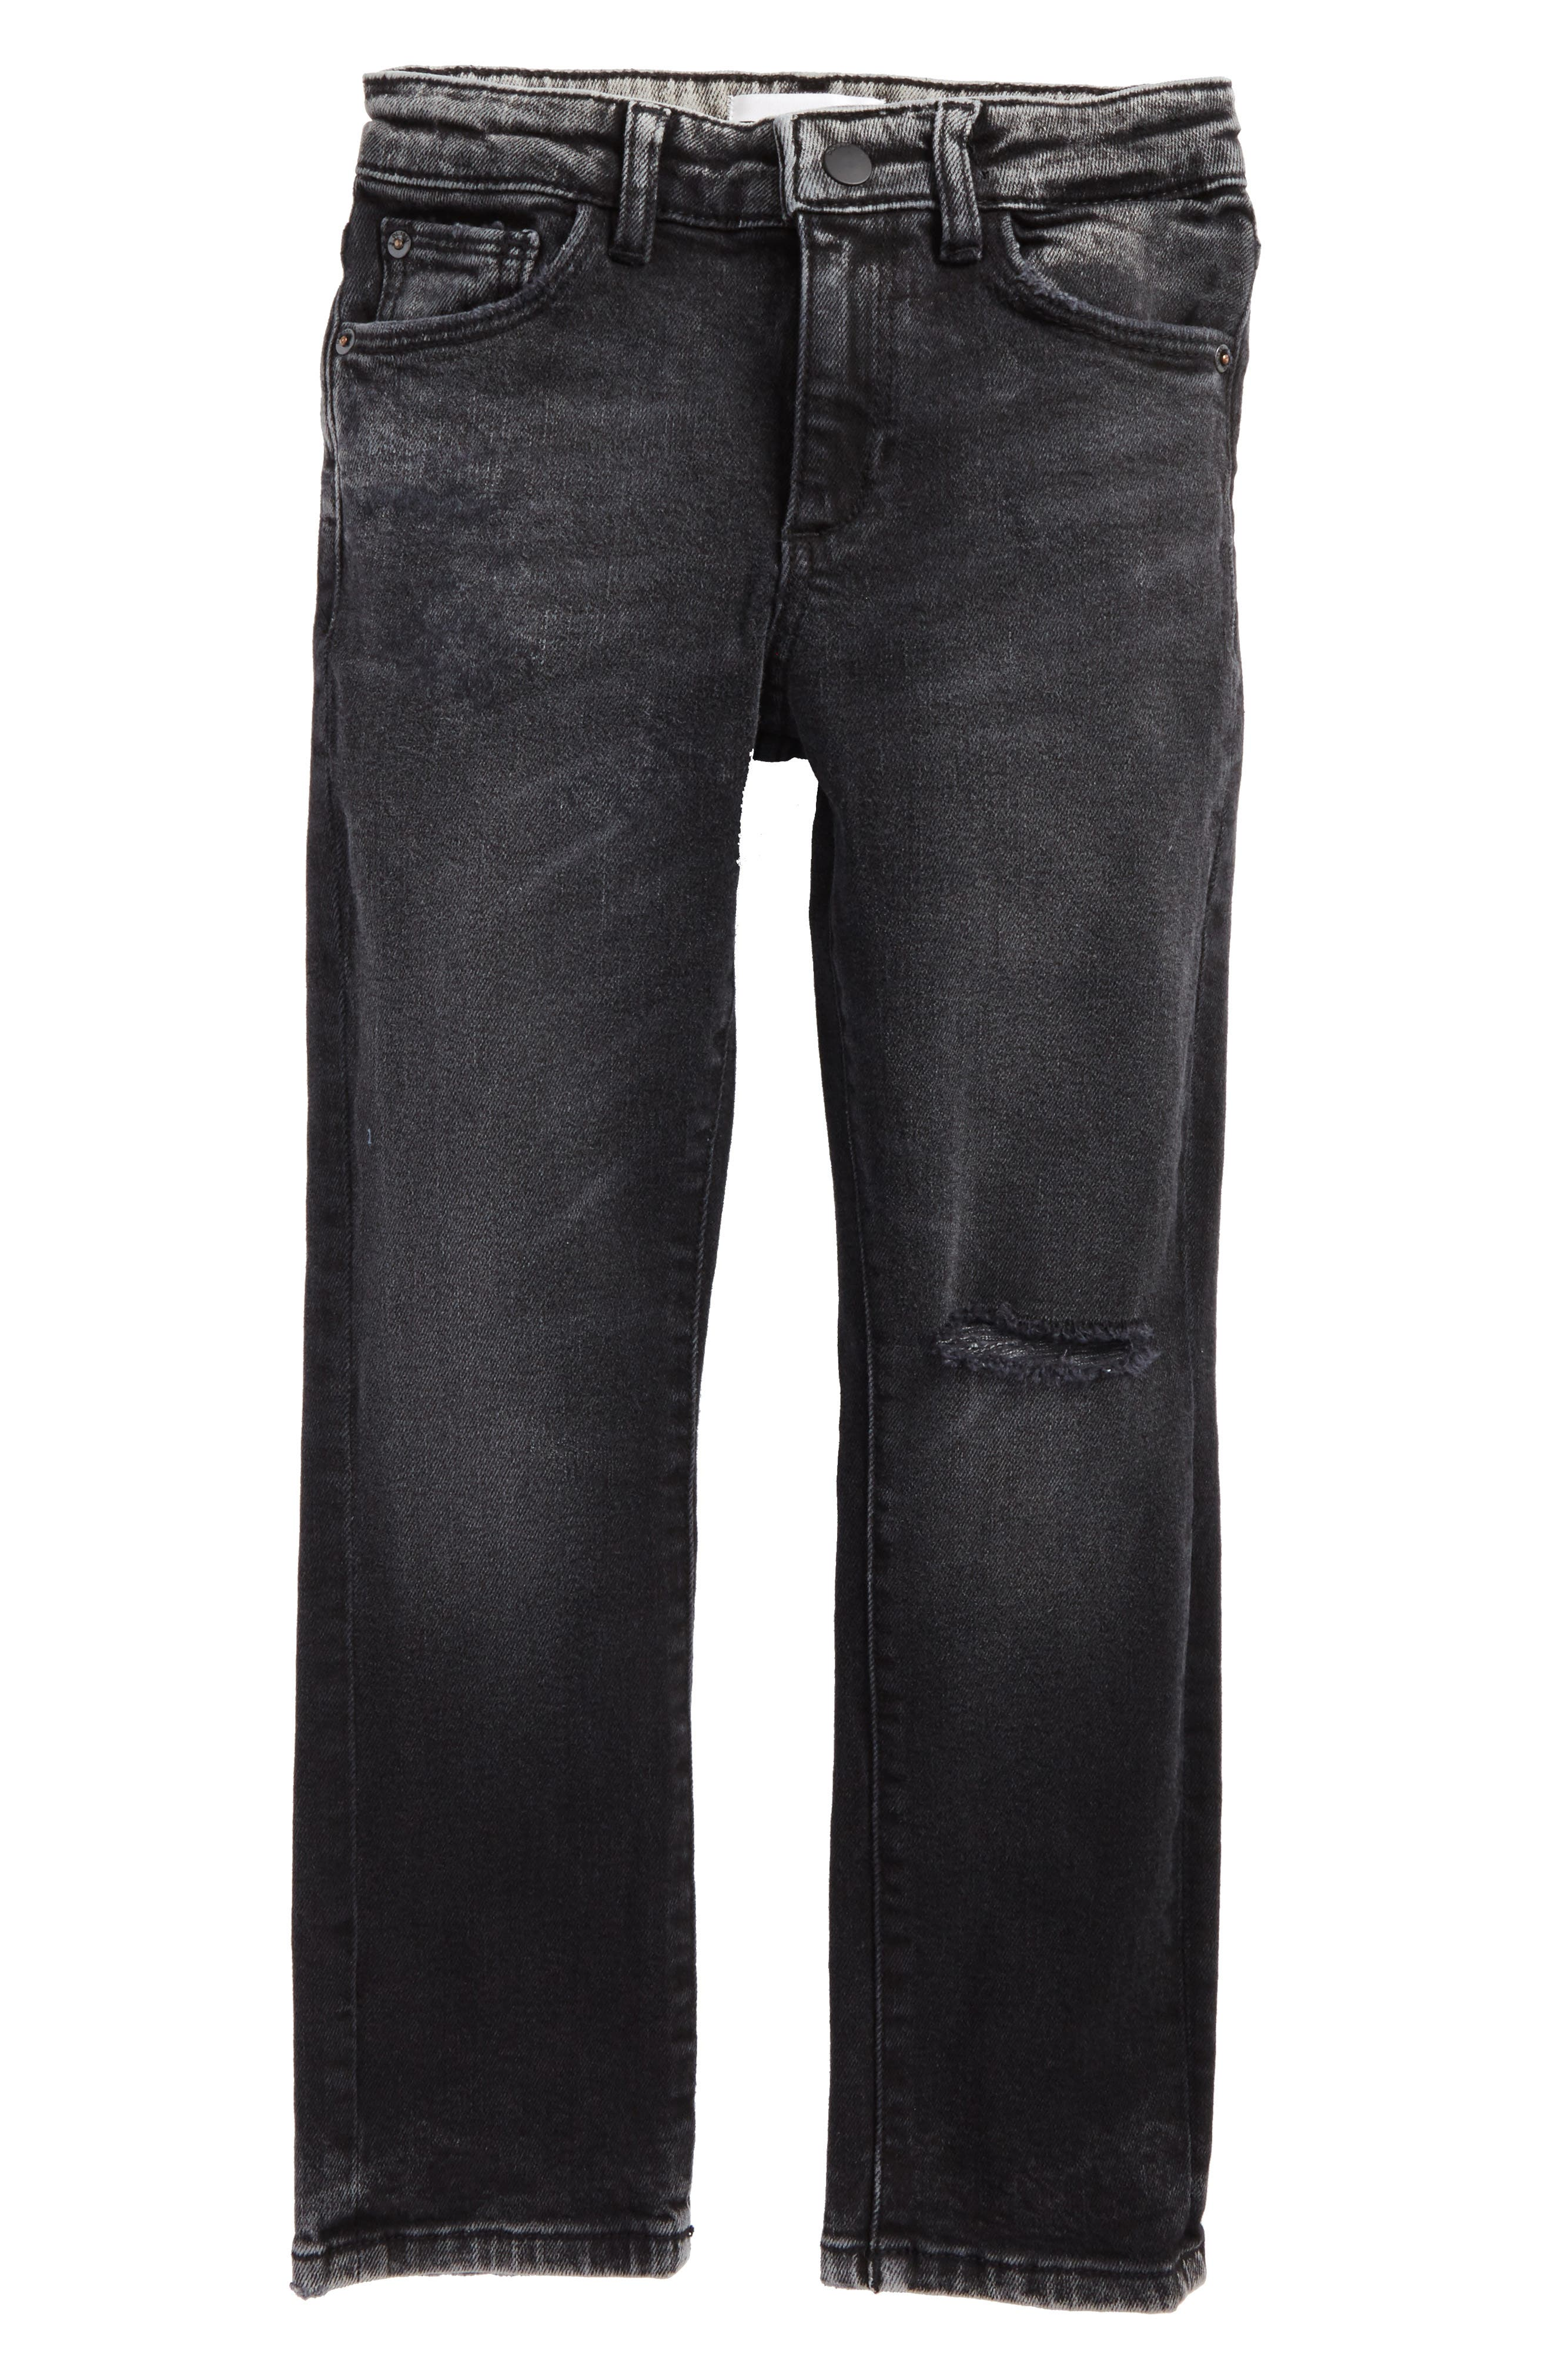 Hawke Skinny Jeans,                         Main,                         color, Argon